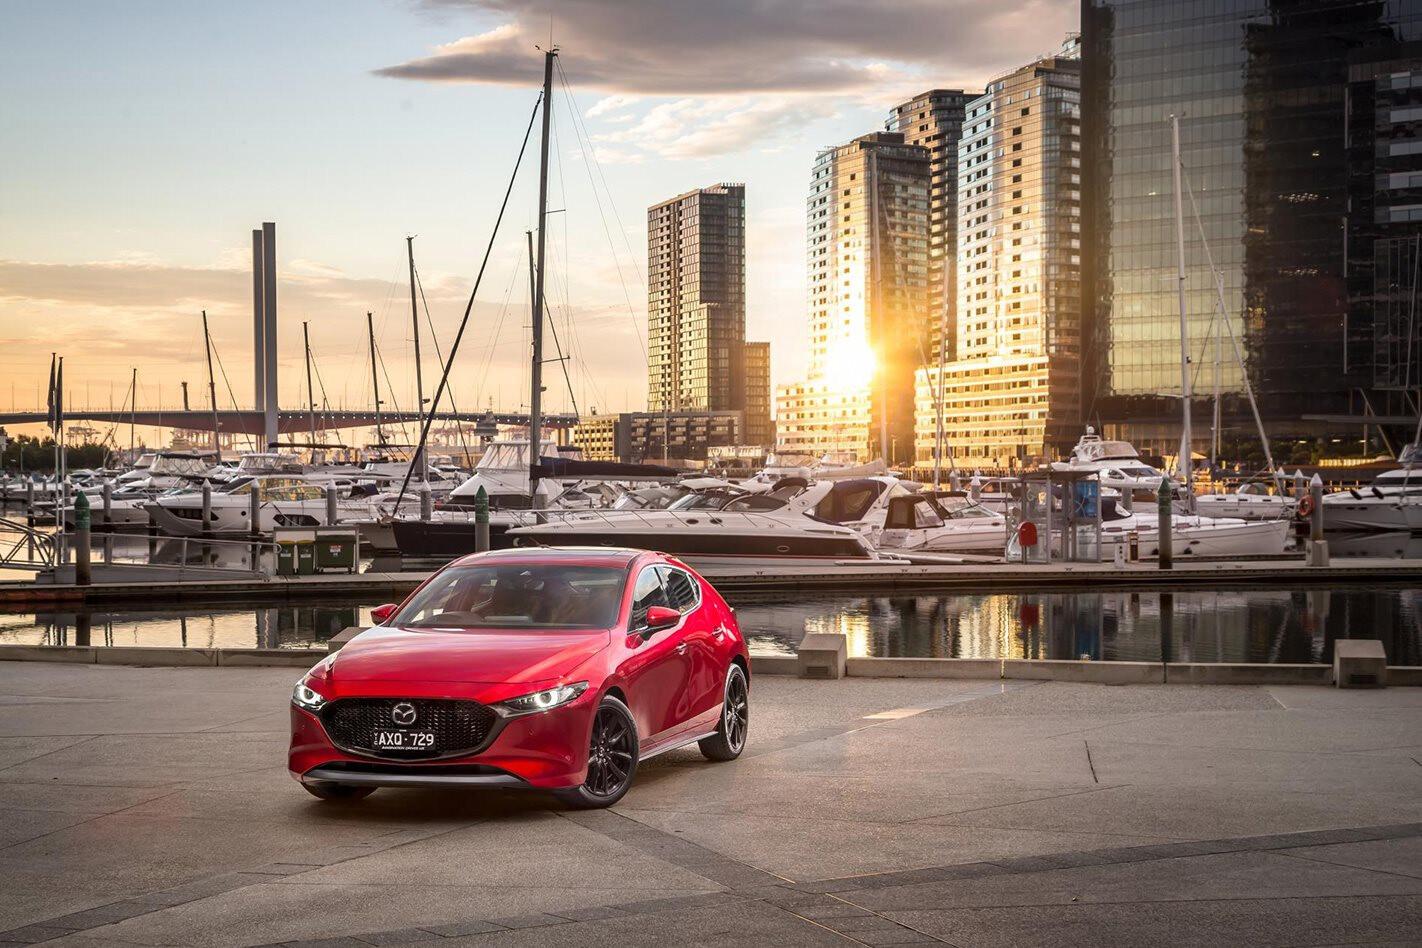 Mazda 3 Sun Jpg